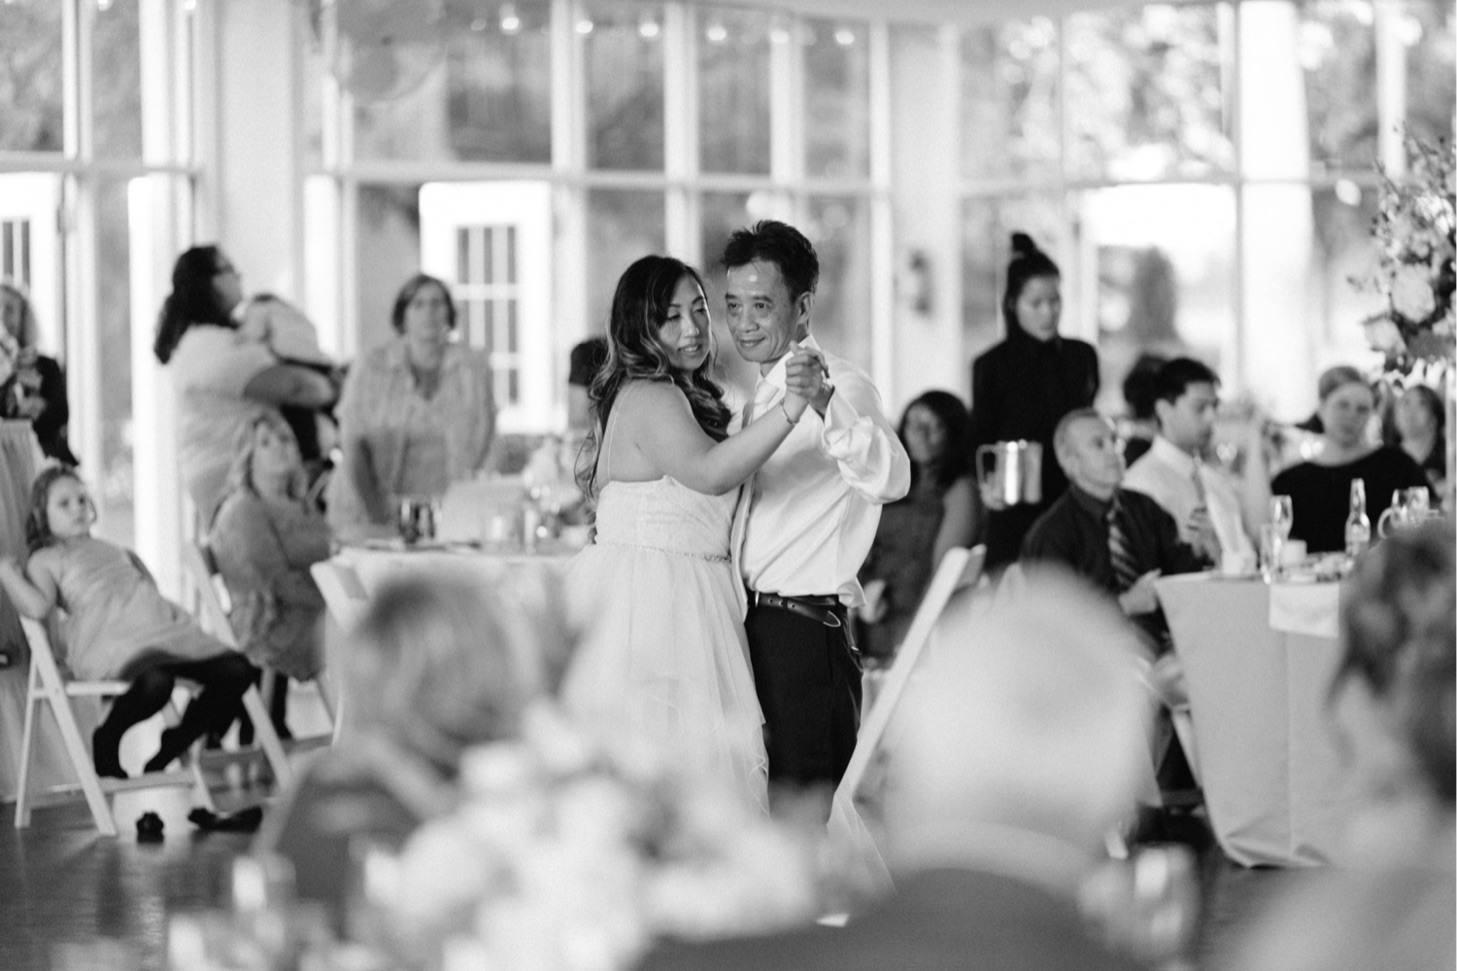 ritz-charles-wedding-reception-downtown-indianapolis-wedding-photographer051.JPG